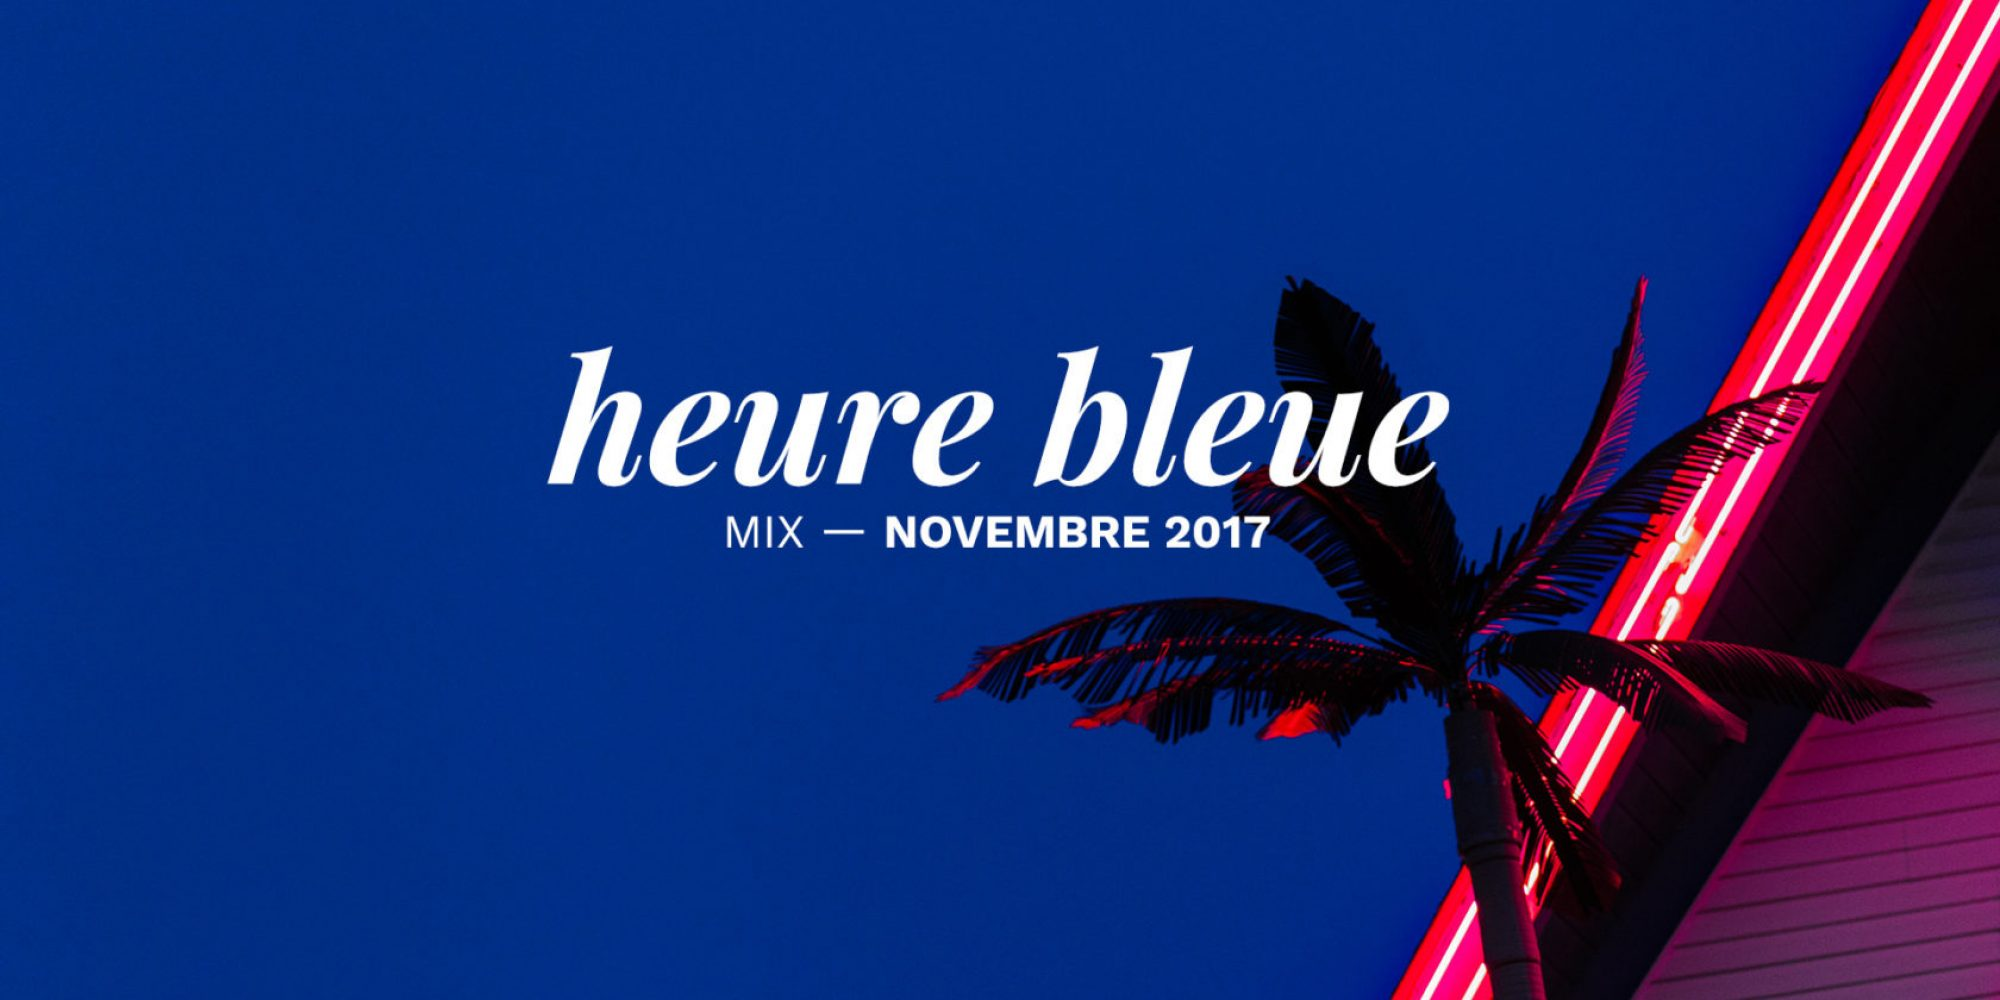 photo mixtape heure bleue novembre